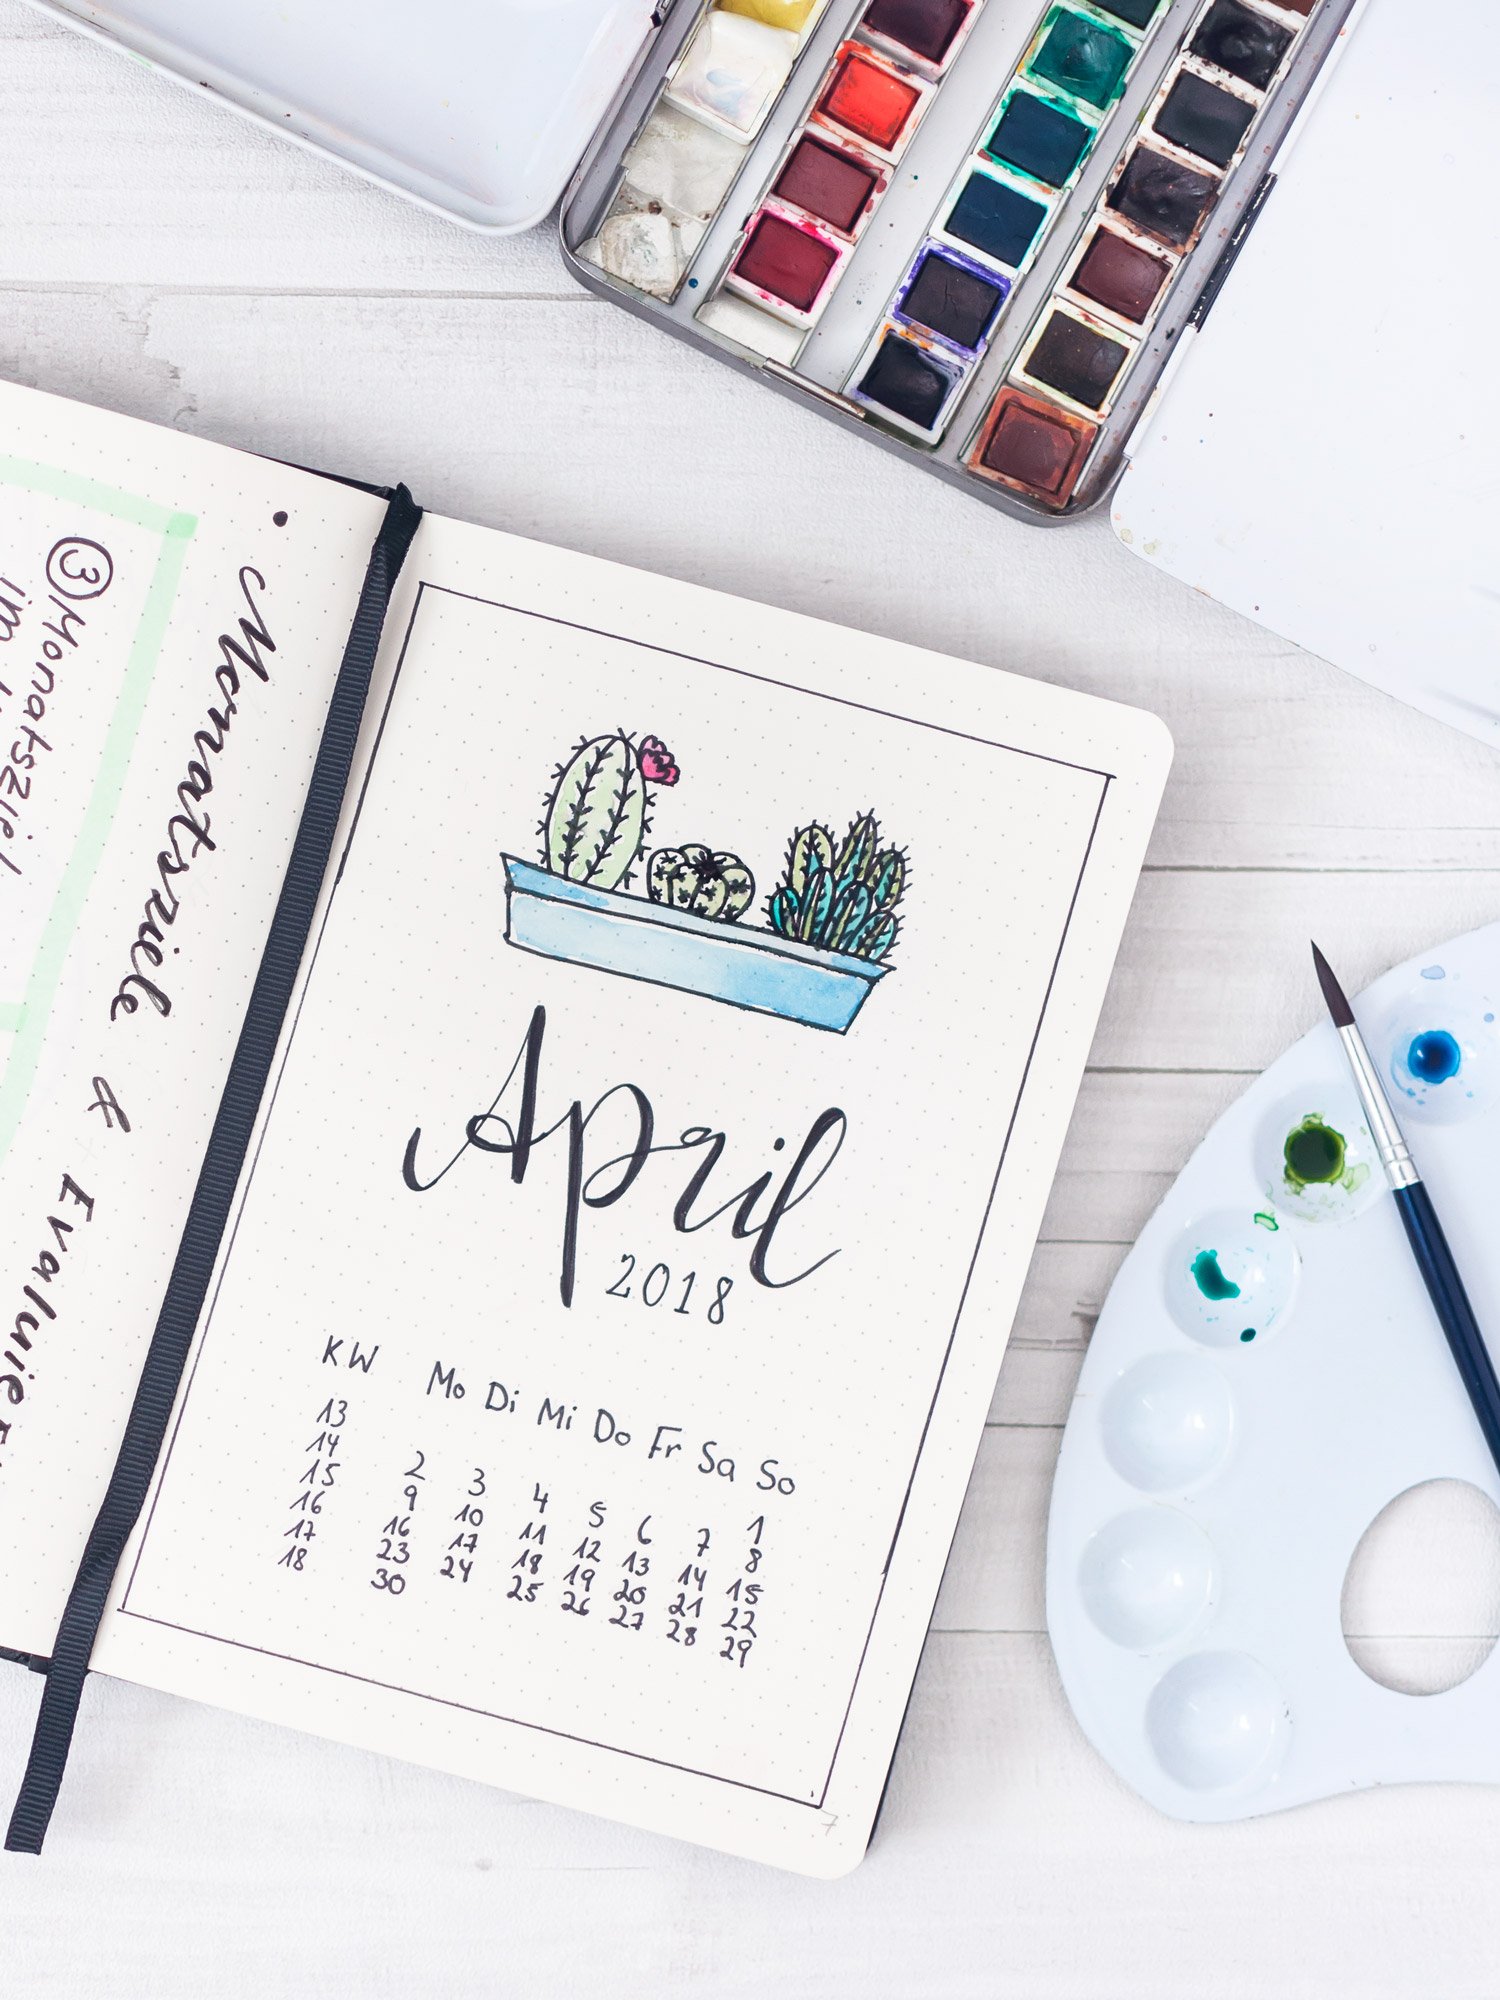 Cover Seite für den Monat April. #bulletjournal #dotted #notizbuch #layout #material #anleitung #aquarell #watercolor #ideen #inspiration #bujo #setup #monatsseiten #übersicht #deckblatt